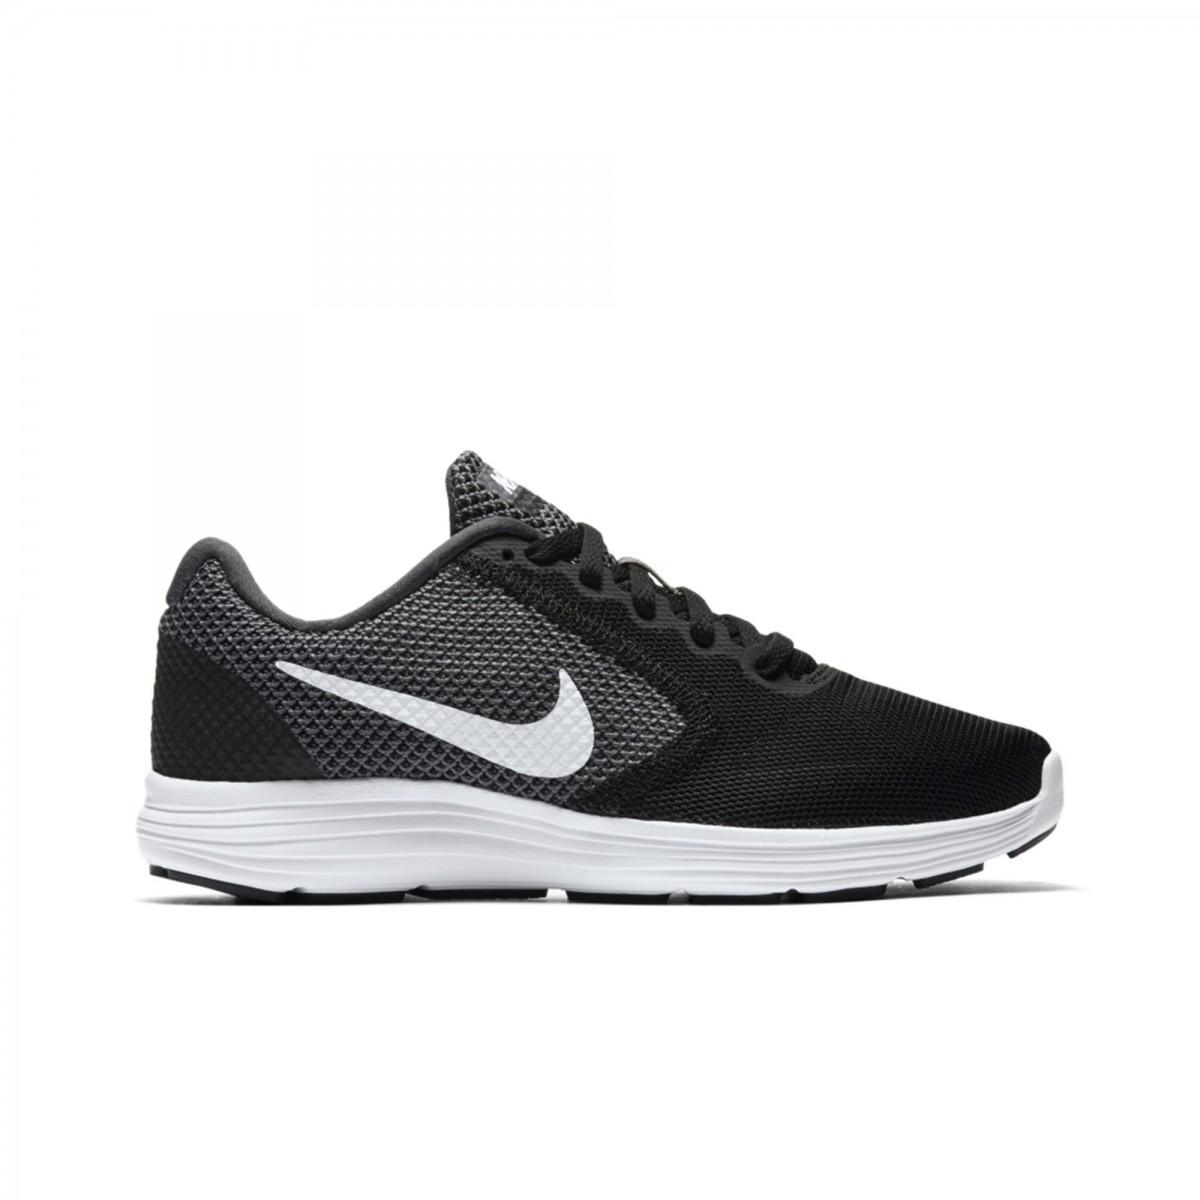 13d604b435 Bizz Store - Tênis Feminino Nike Revolution 3 Preto Corrida